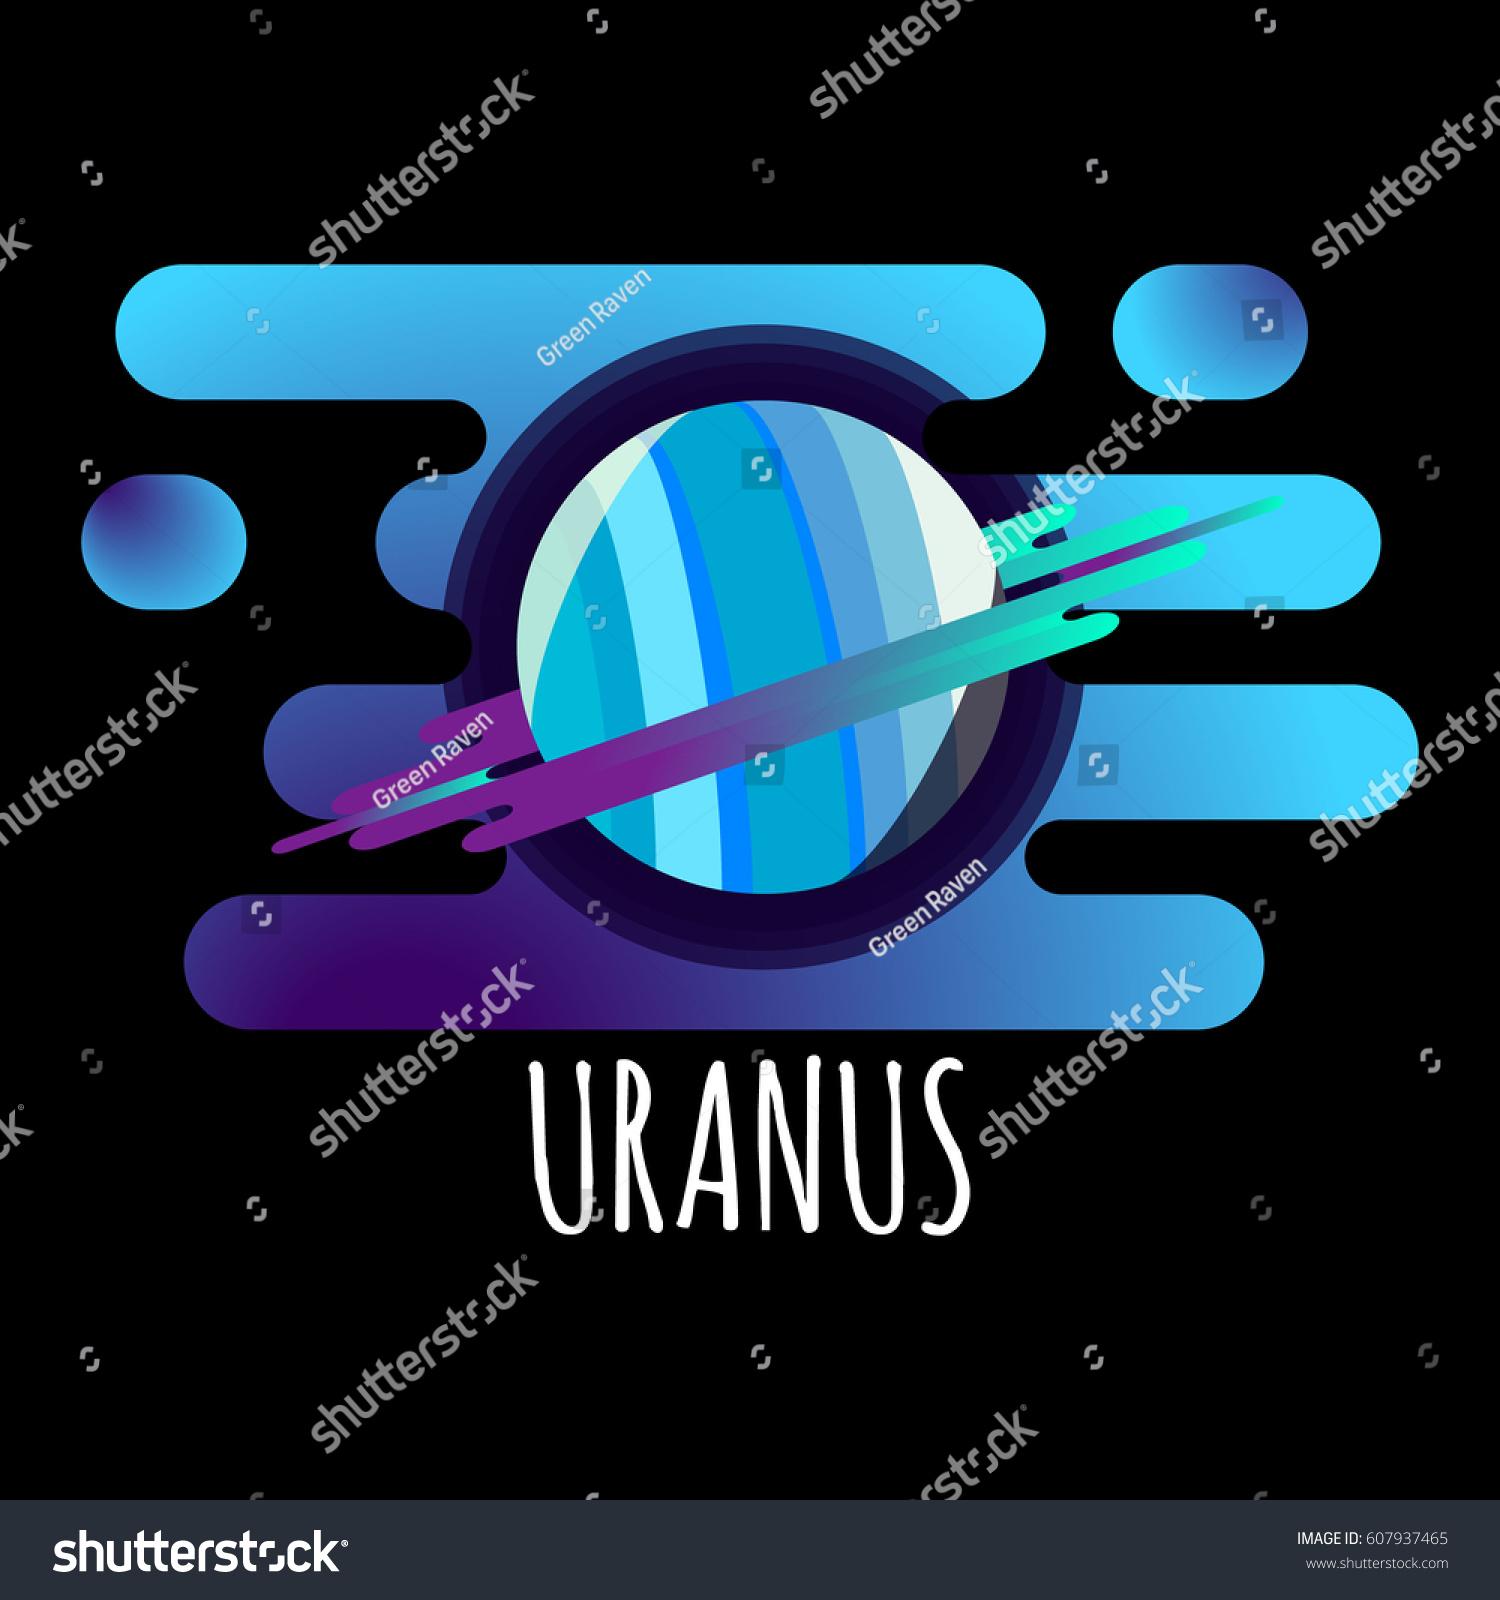 Vector Illustration Uranus Planet Flat Designed Stock Photo Photo